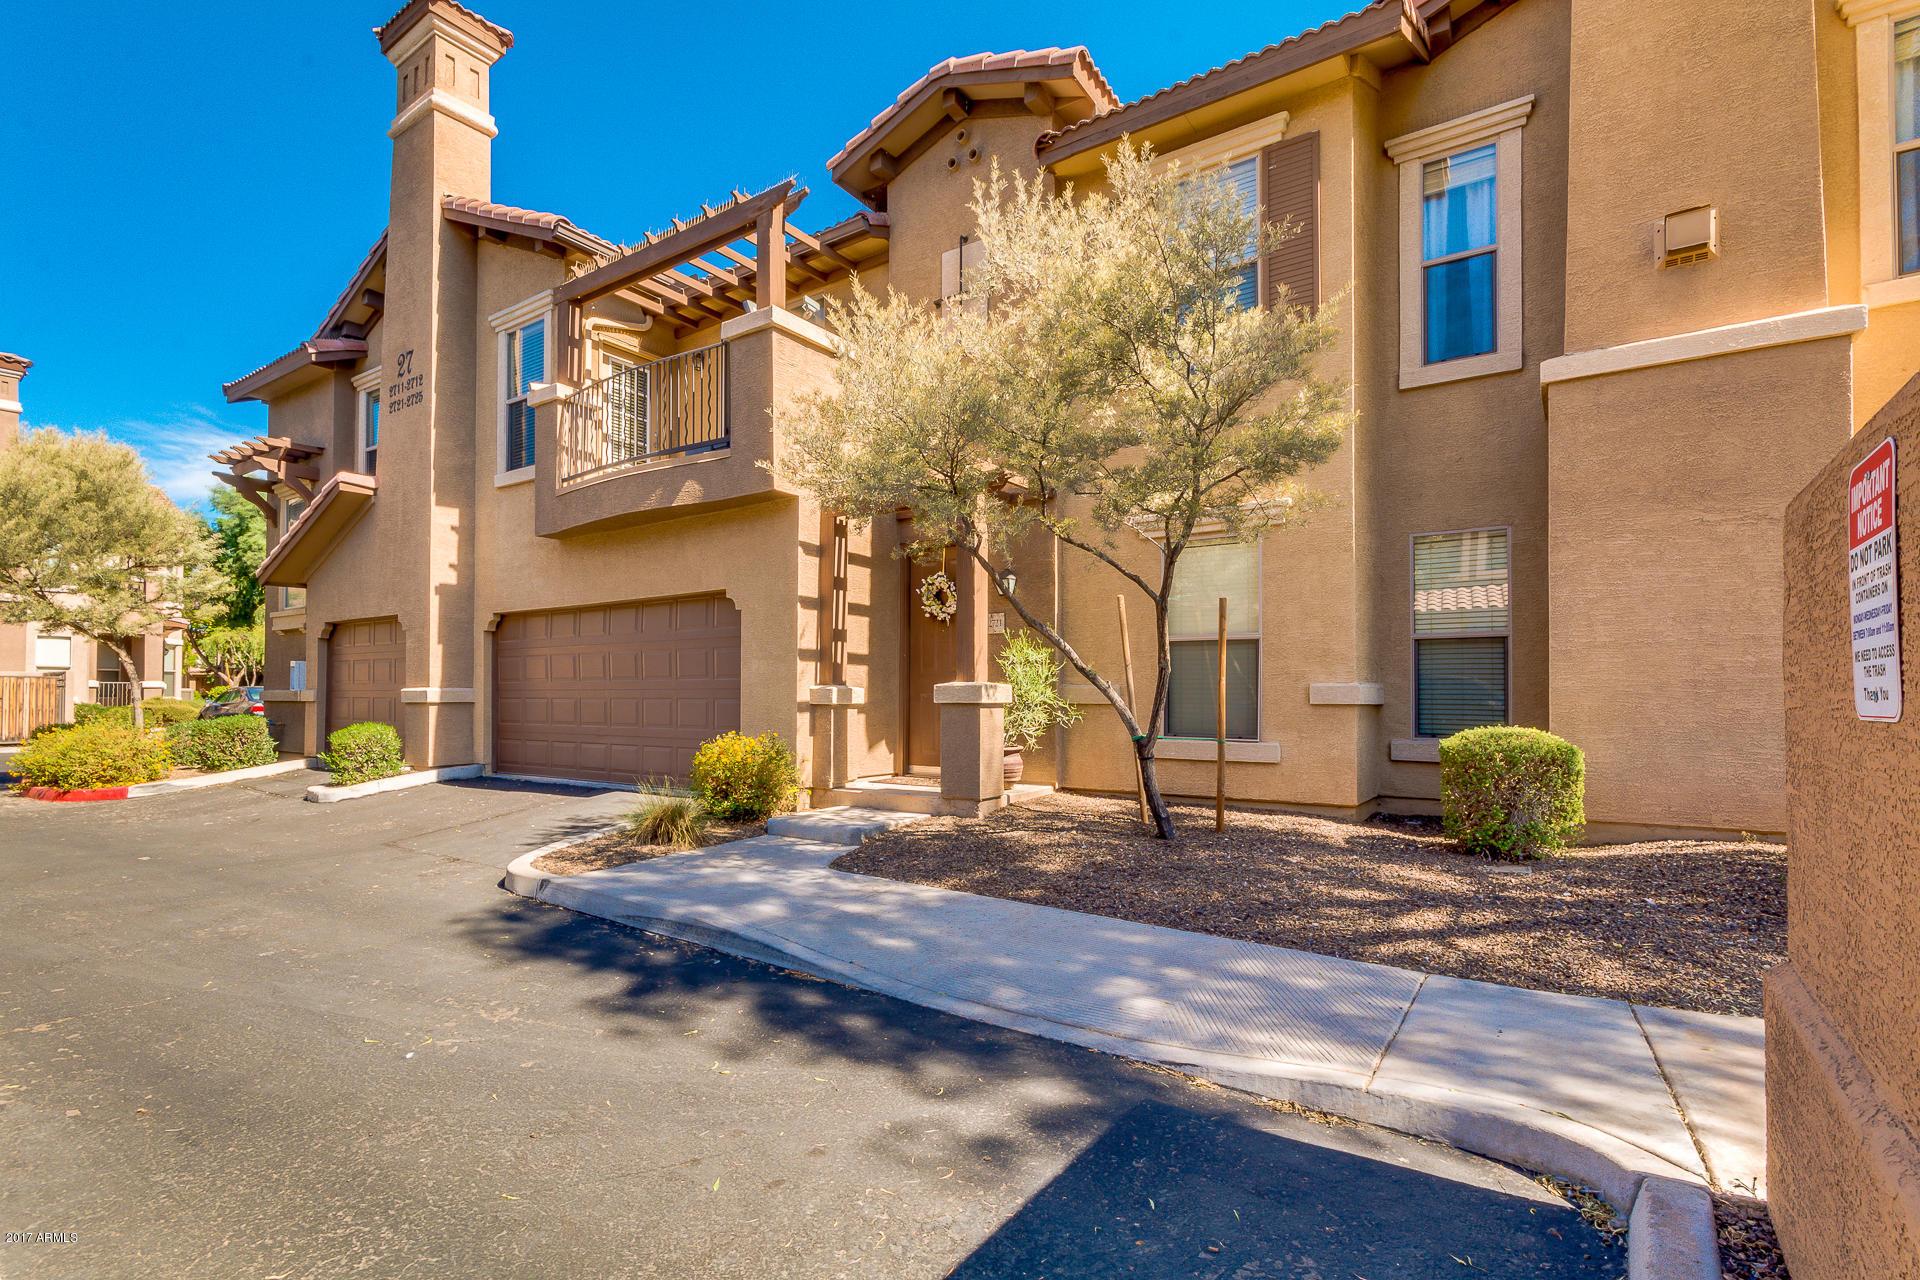 14250 W Wigwam Boulevard, Unit 2721, Litchfield Park AZ 85340 - Photo 2